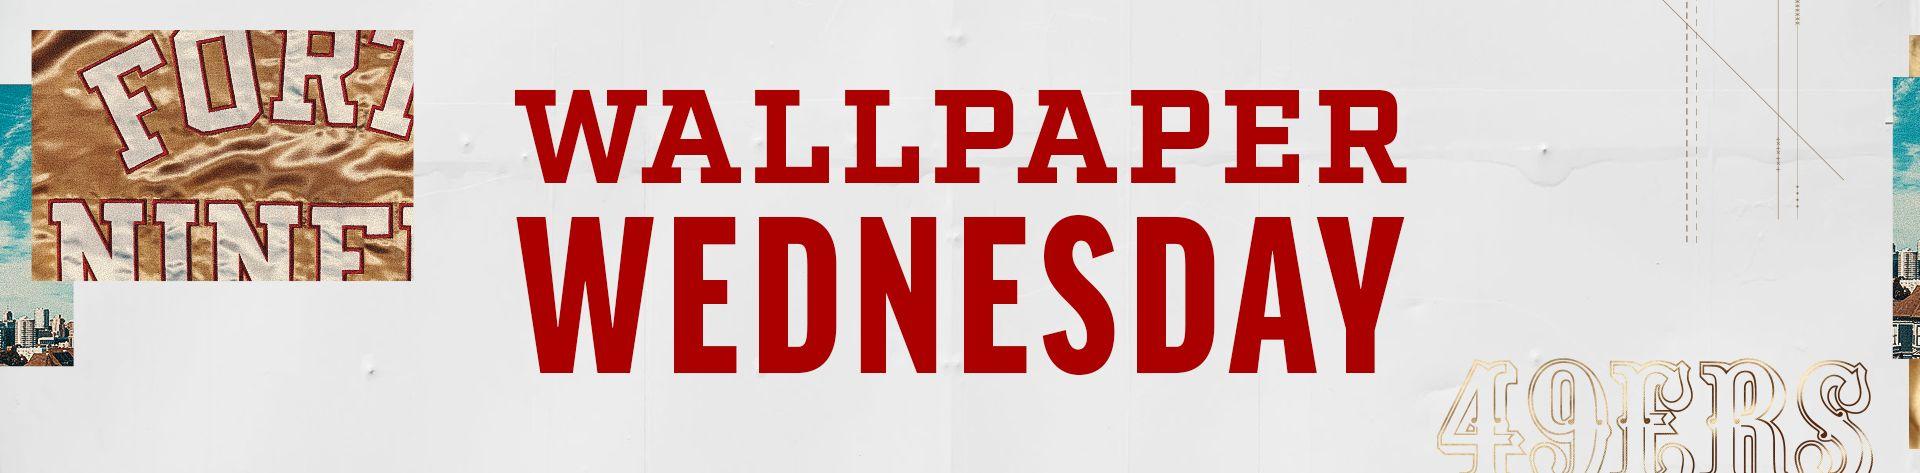 WallpaperWednesday-Header